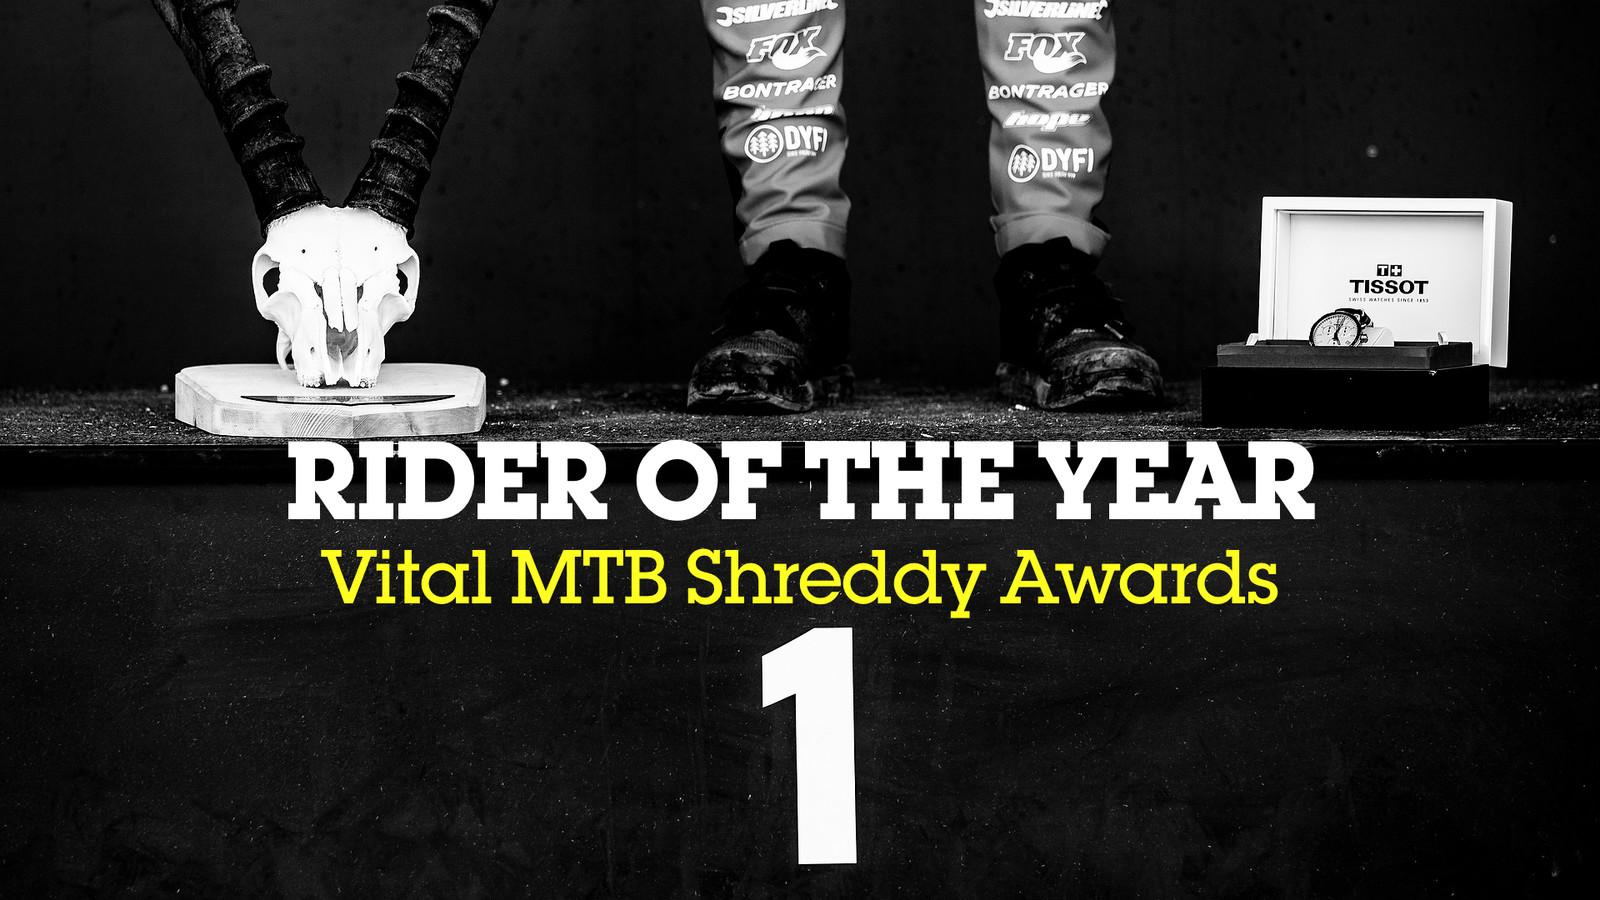 Rider of the Year - Shreddy Awards